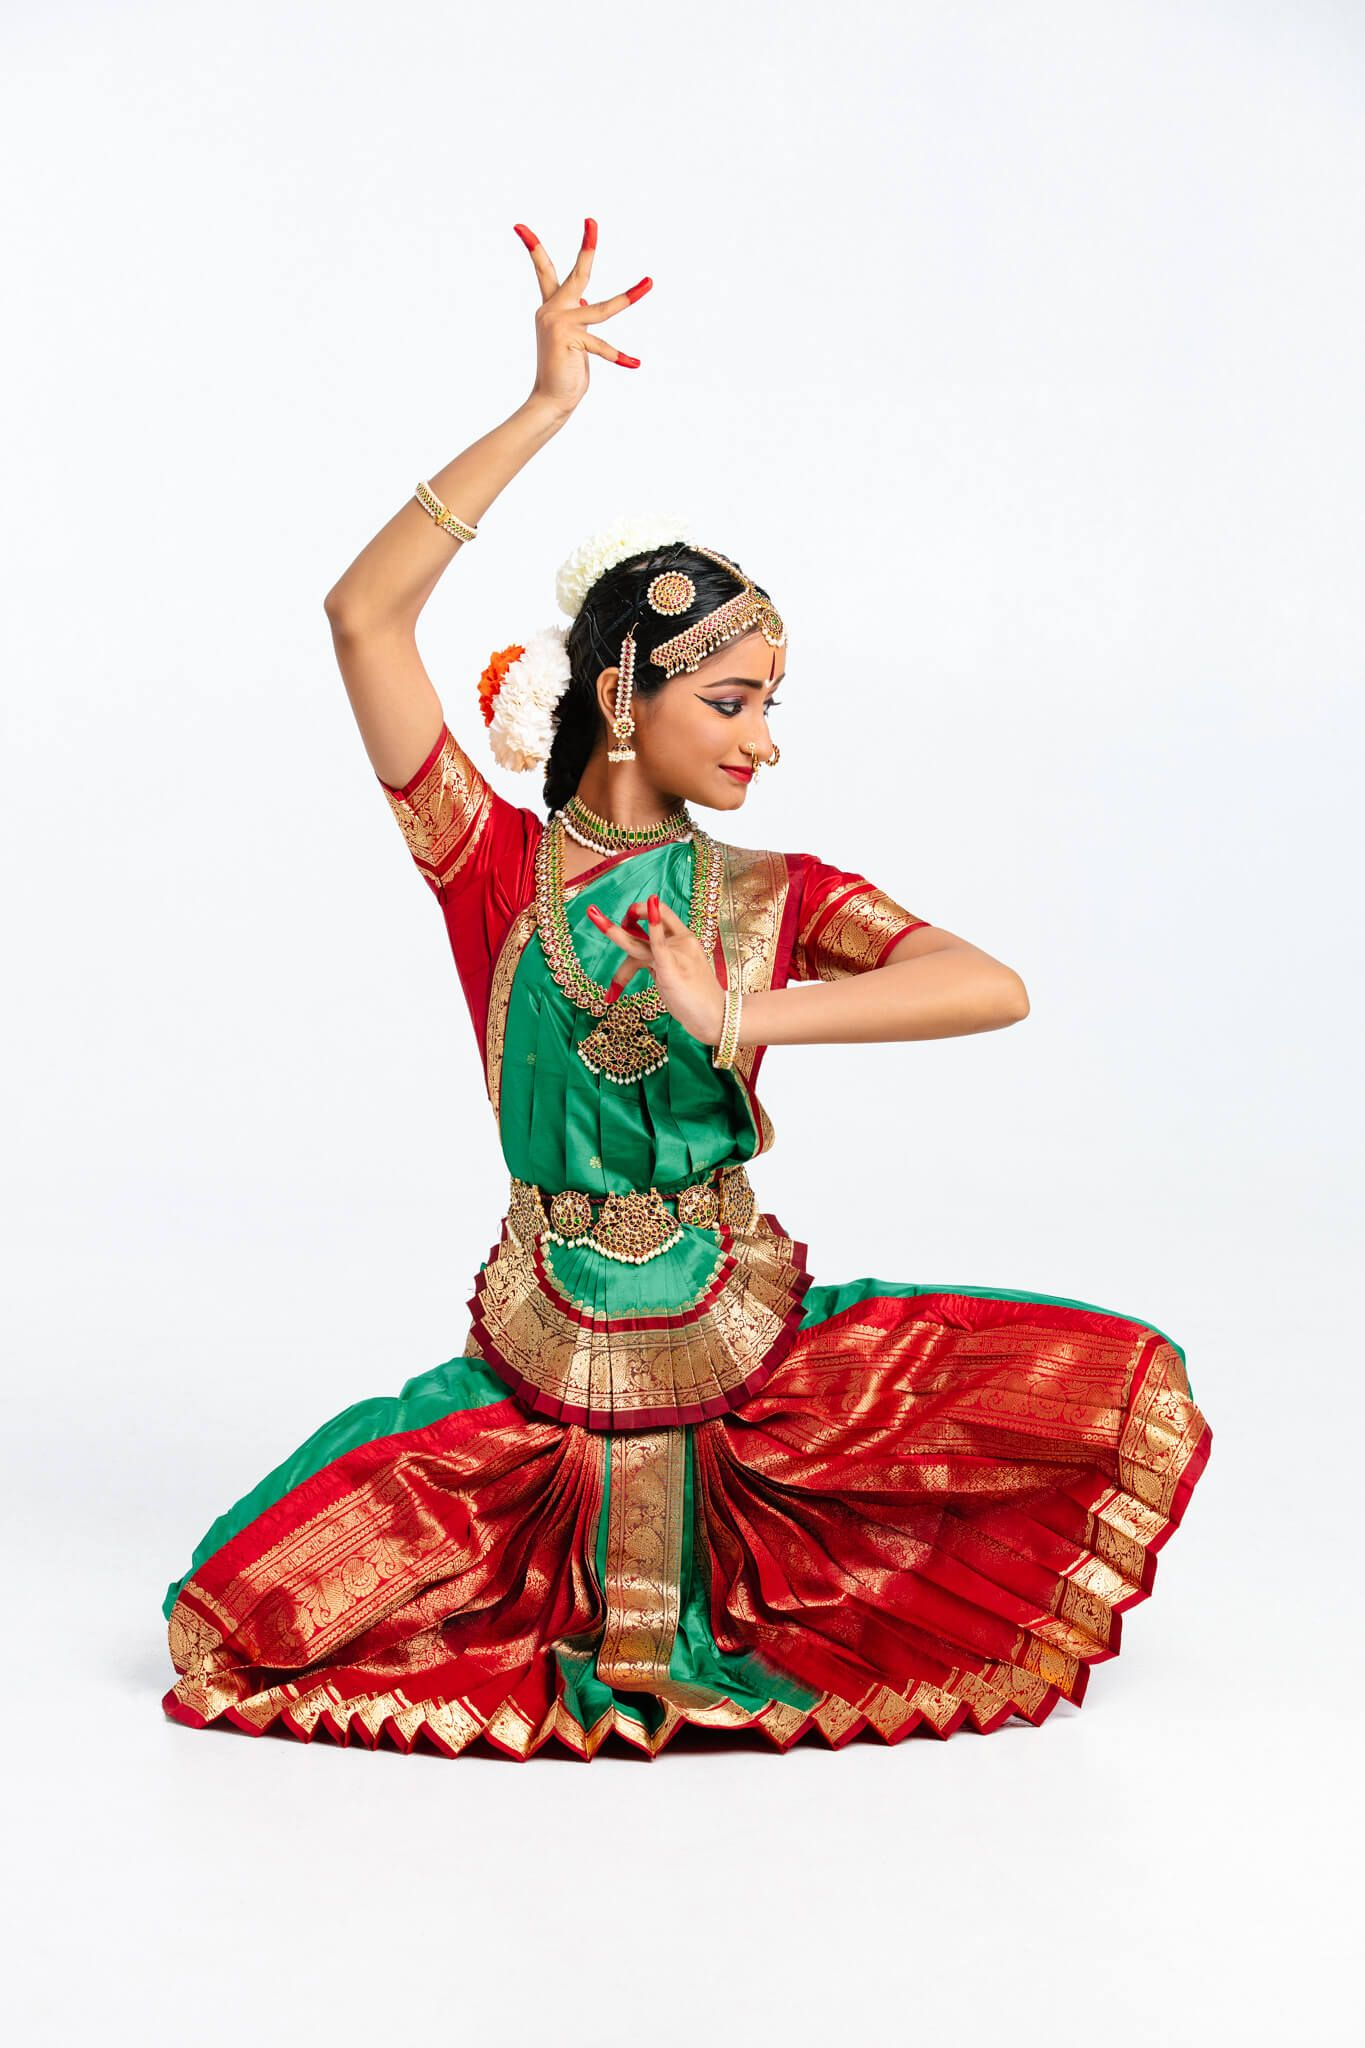 Natesha School Of Bharatanatyam Portrait With Ananya With Images Bharatanatyam Indian Classical Dance Dance Poses